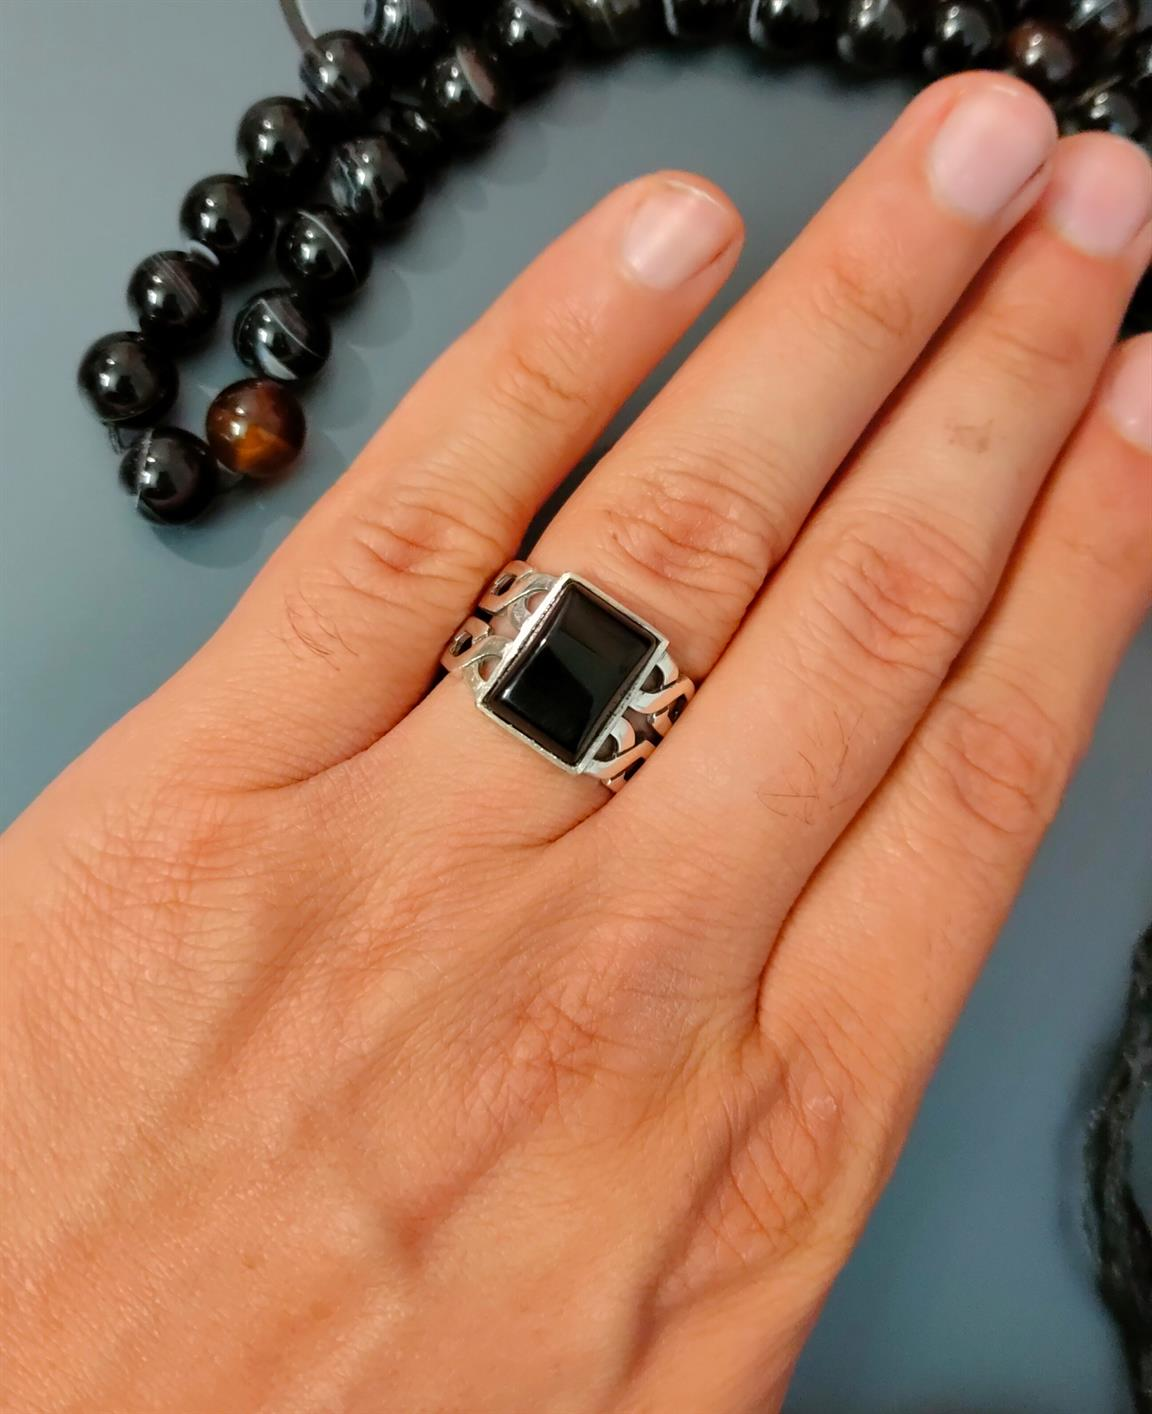 Black Aqeeq Ring 3 natural gemstones pakistan + 925 silver jewelry online